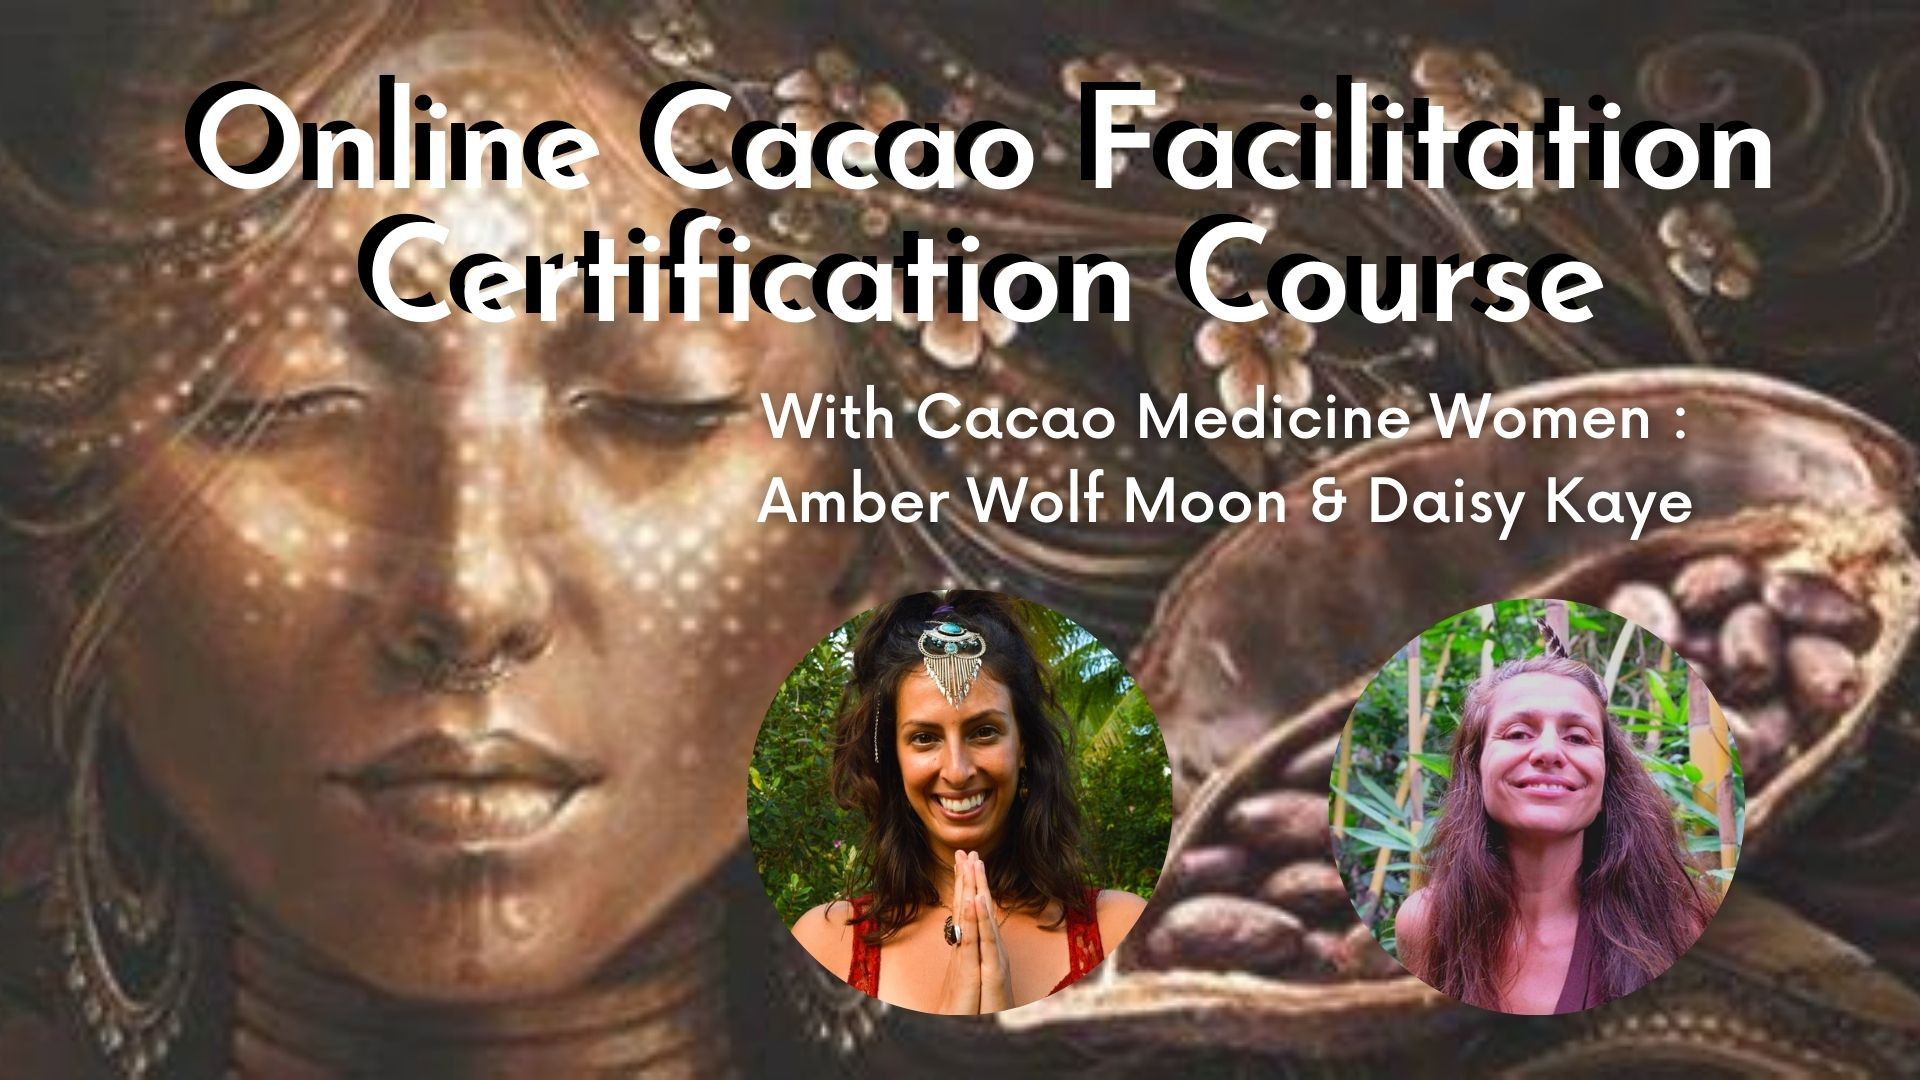 Online Cacao Facilitation Course